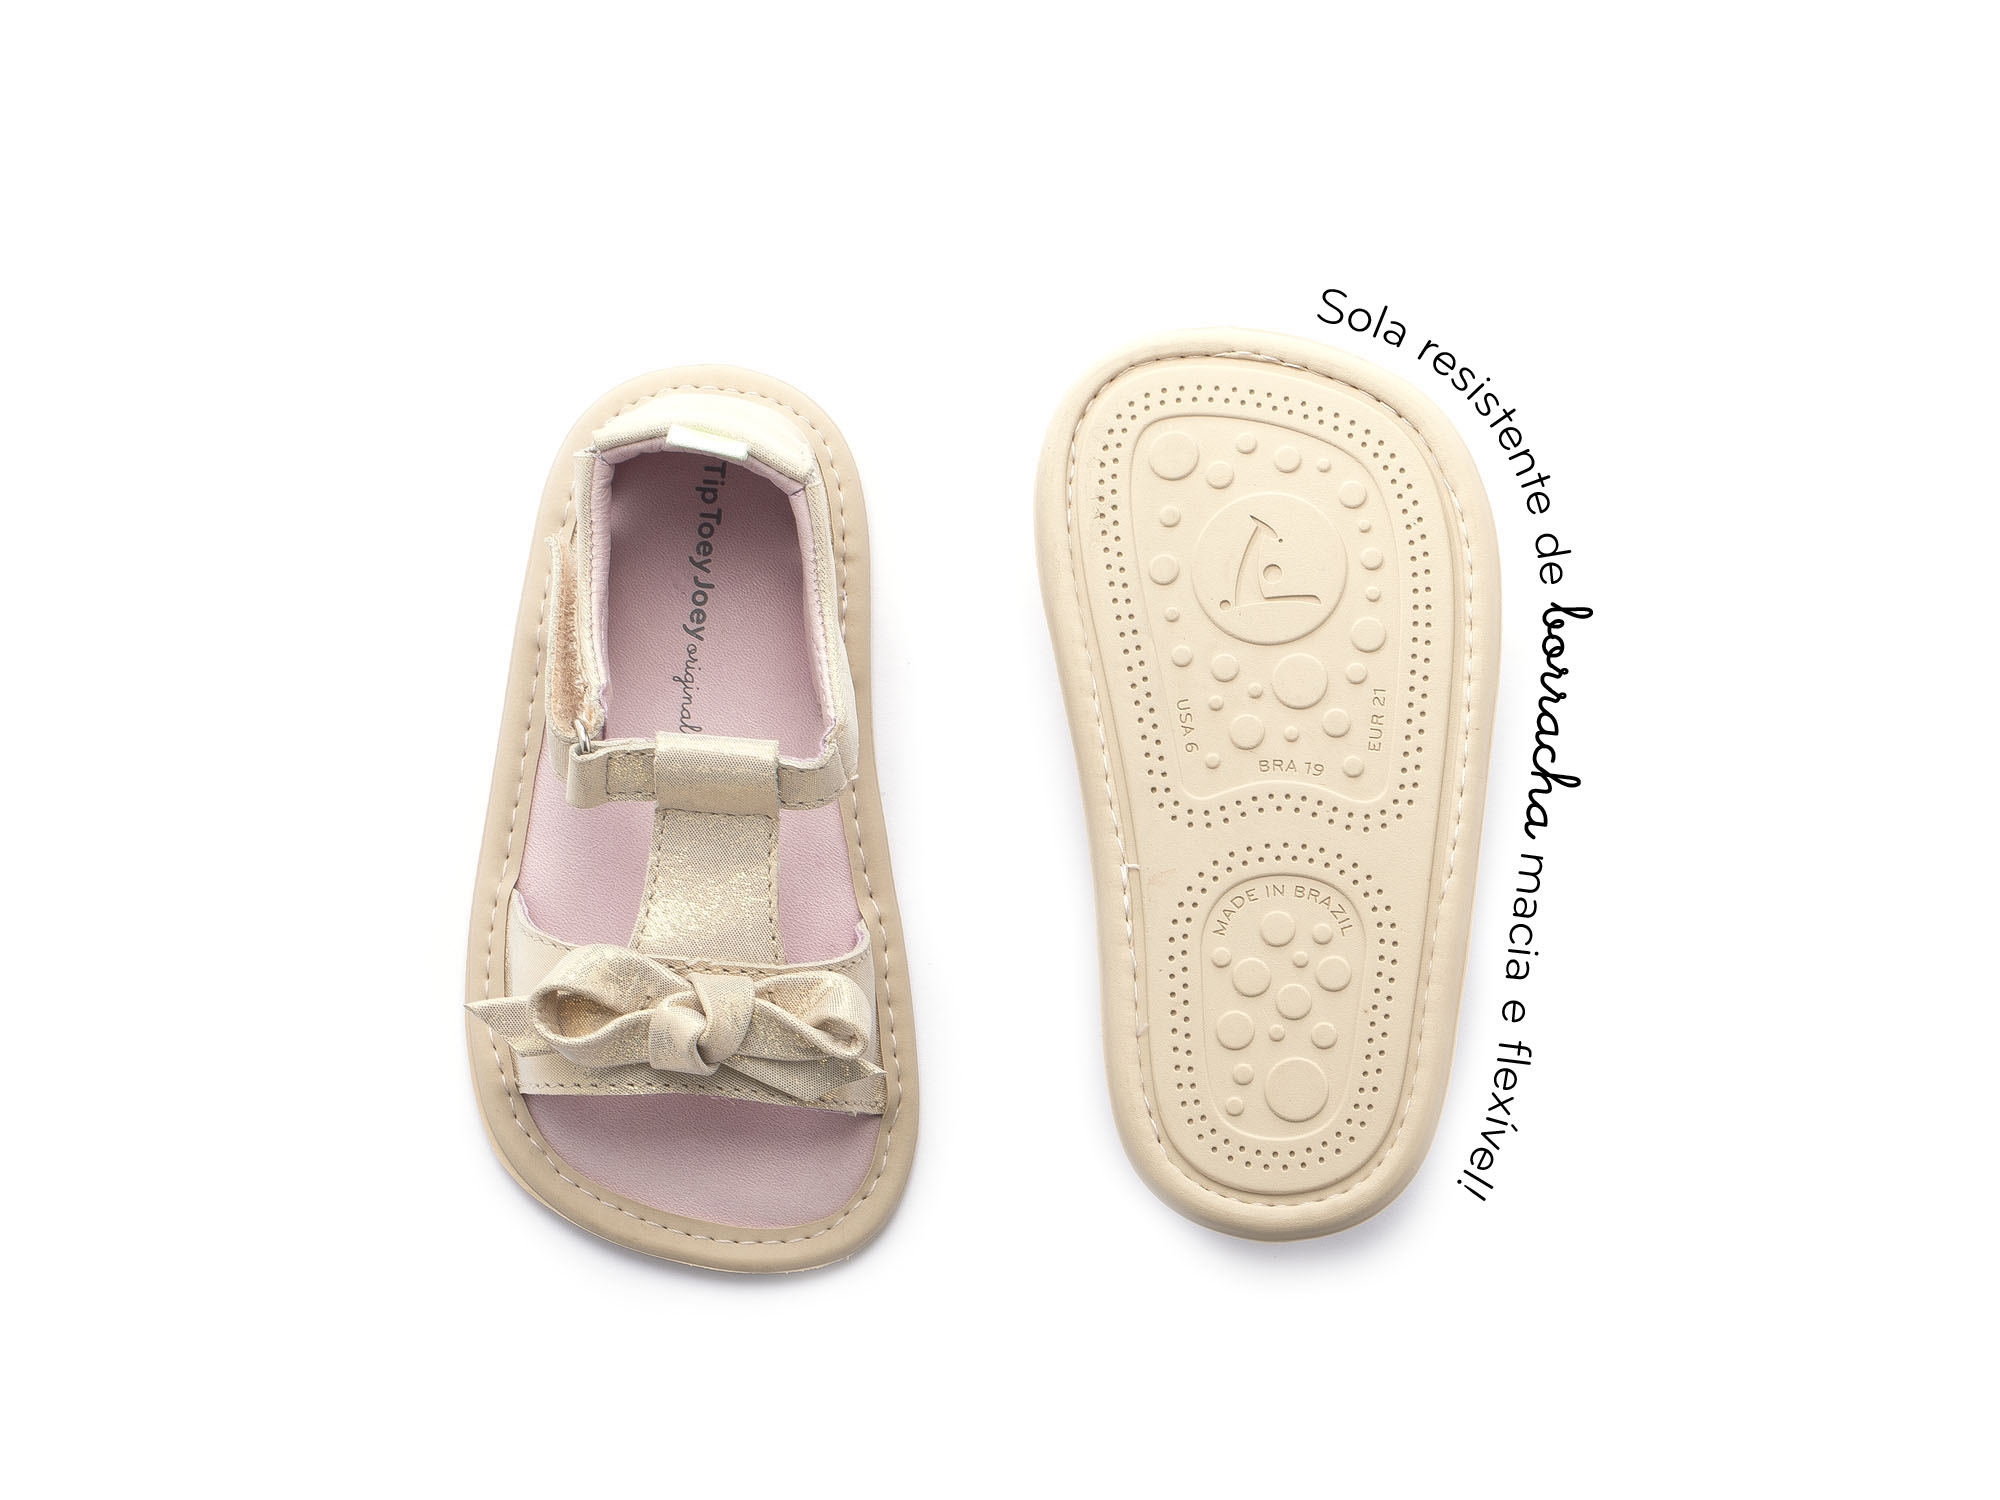 Sandália Whimsy Cotton Candy Foil Baby 0 à 2 anos - 1